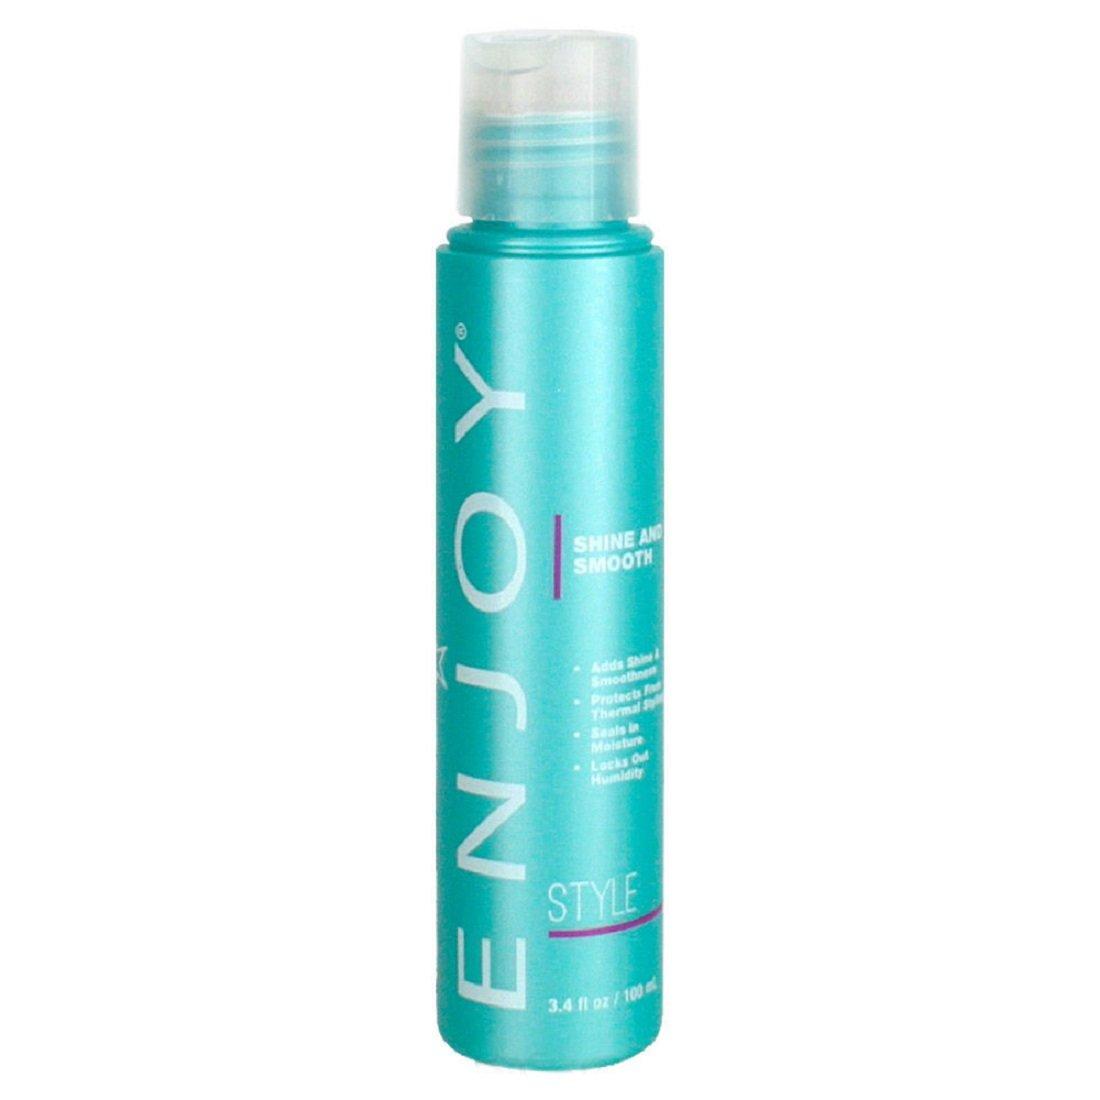 ENJOY Shine and Smooth (3.4 OZ) Hair Shine and Smooth Enhancing Formula to Repair Damaged Hair